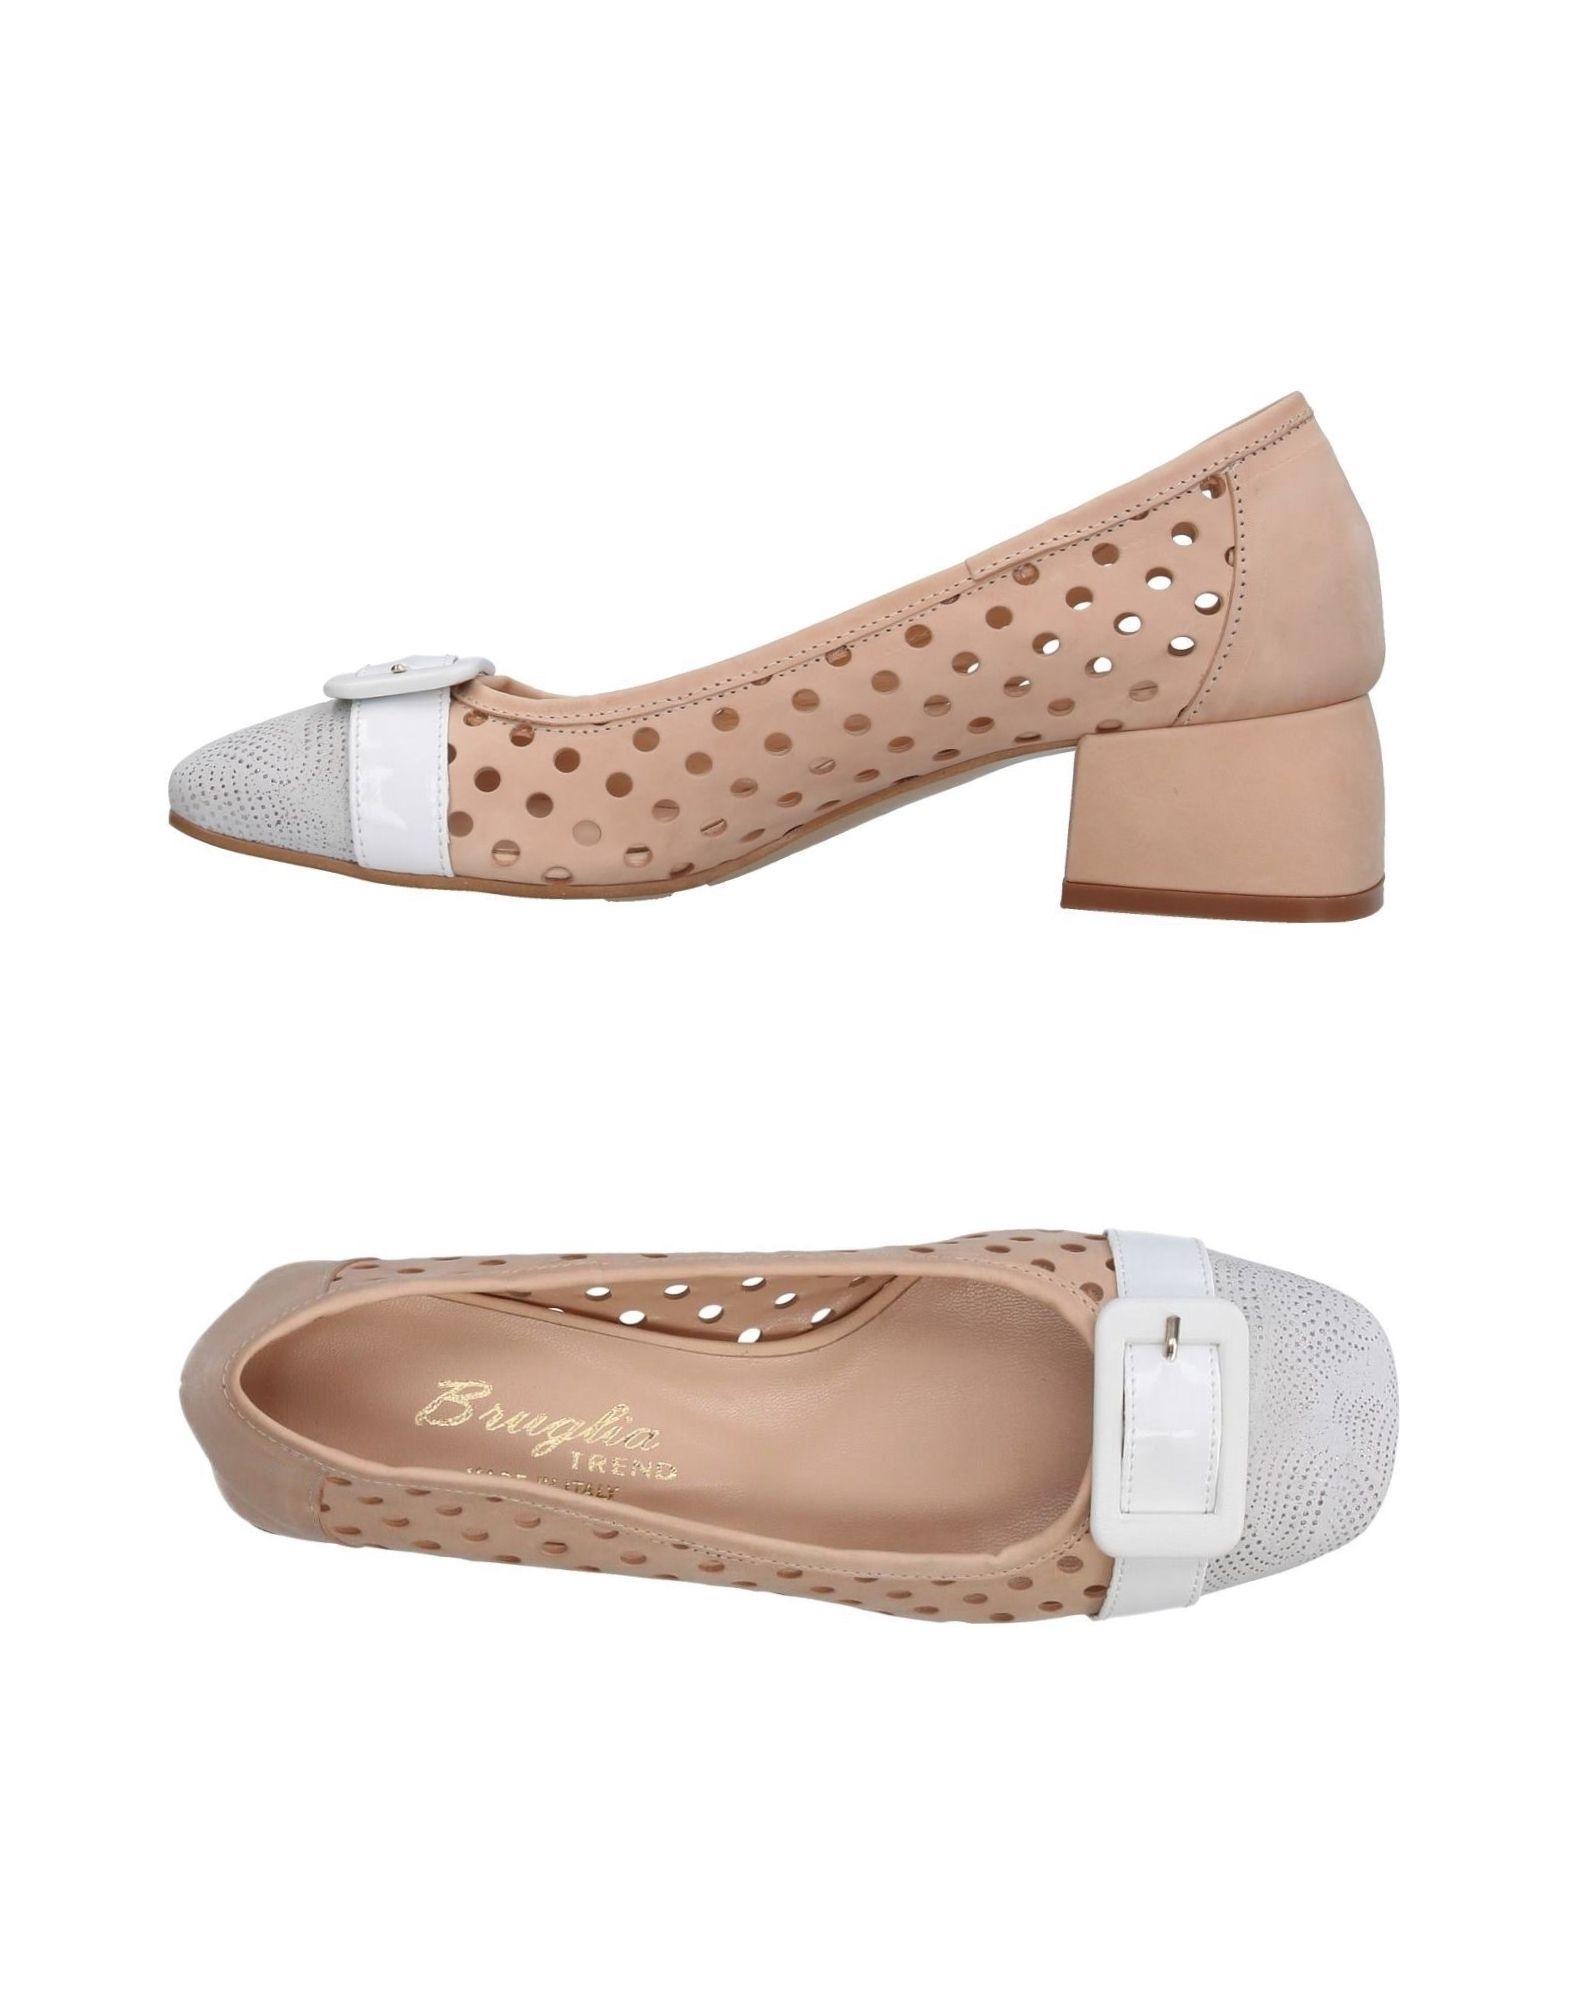 F.Lli Bruglia Pumps Damen  11408480OW Gute Qualität beliebte Schuhe